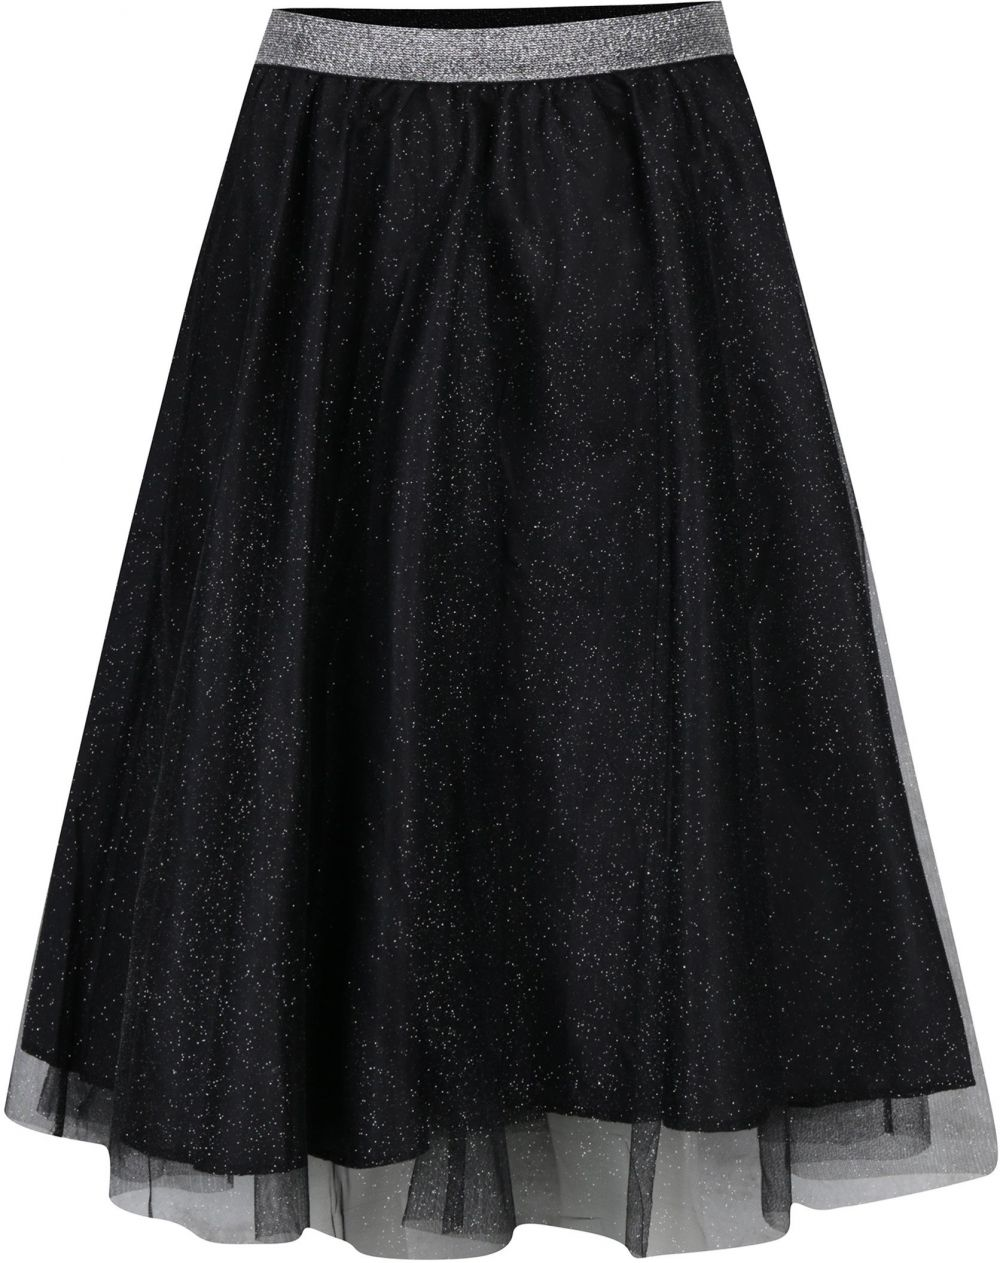 d5da73565f0a Čierna tylová sukňa s trblietkami Haily s Party značky Haily´s - Lovely.sk